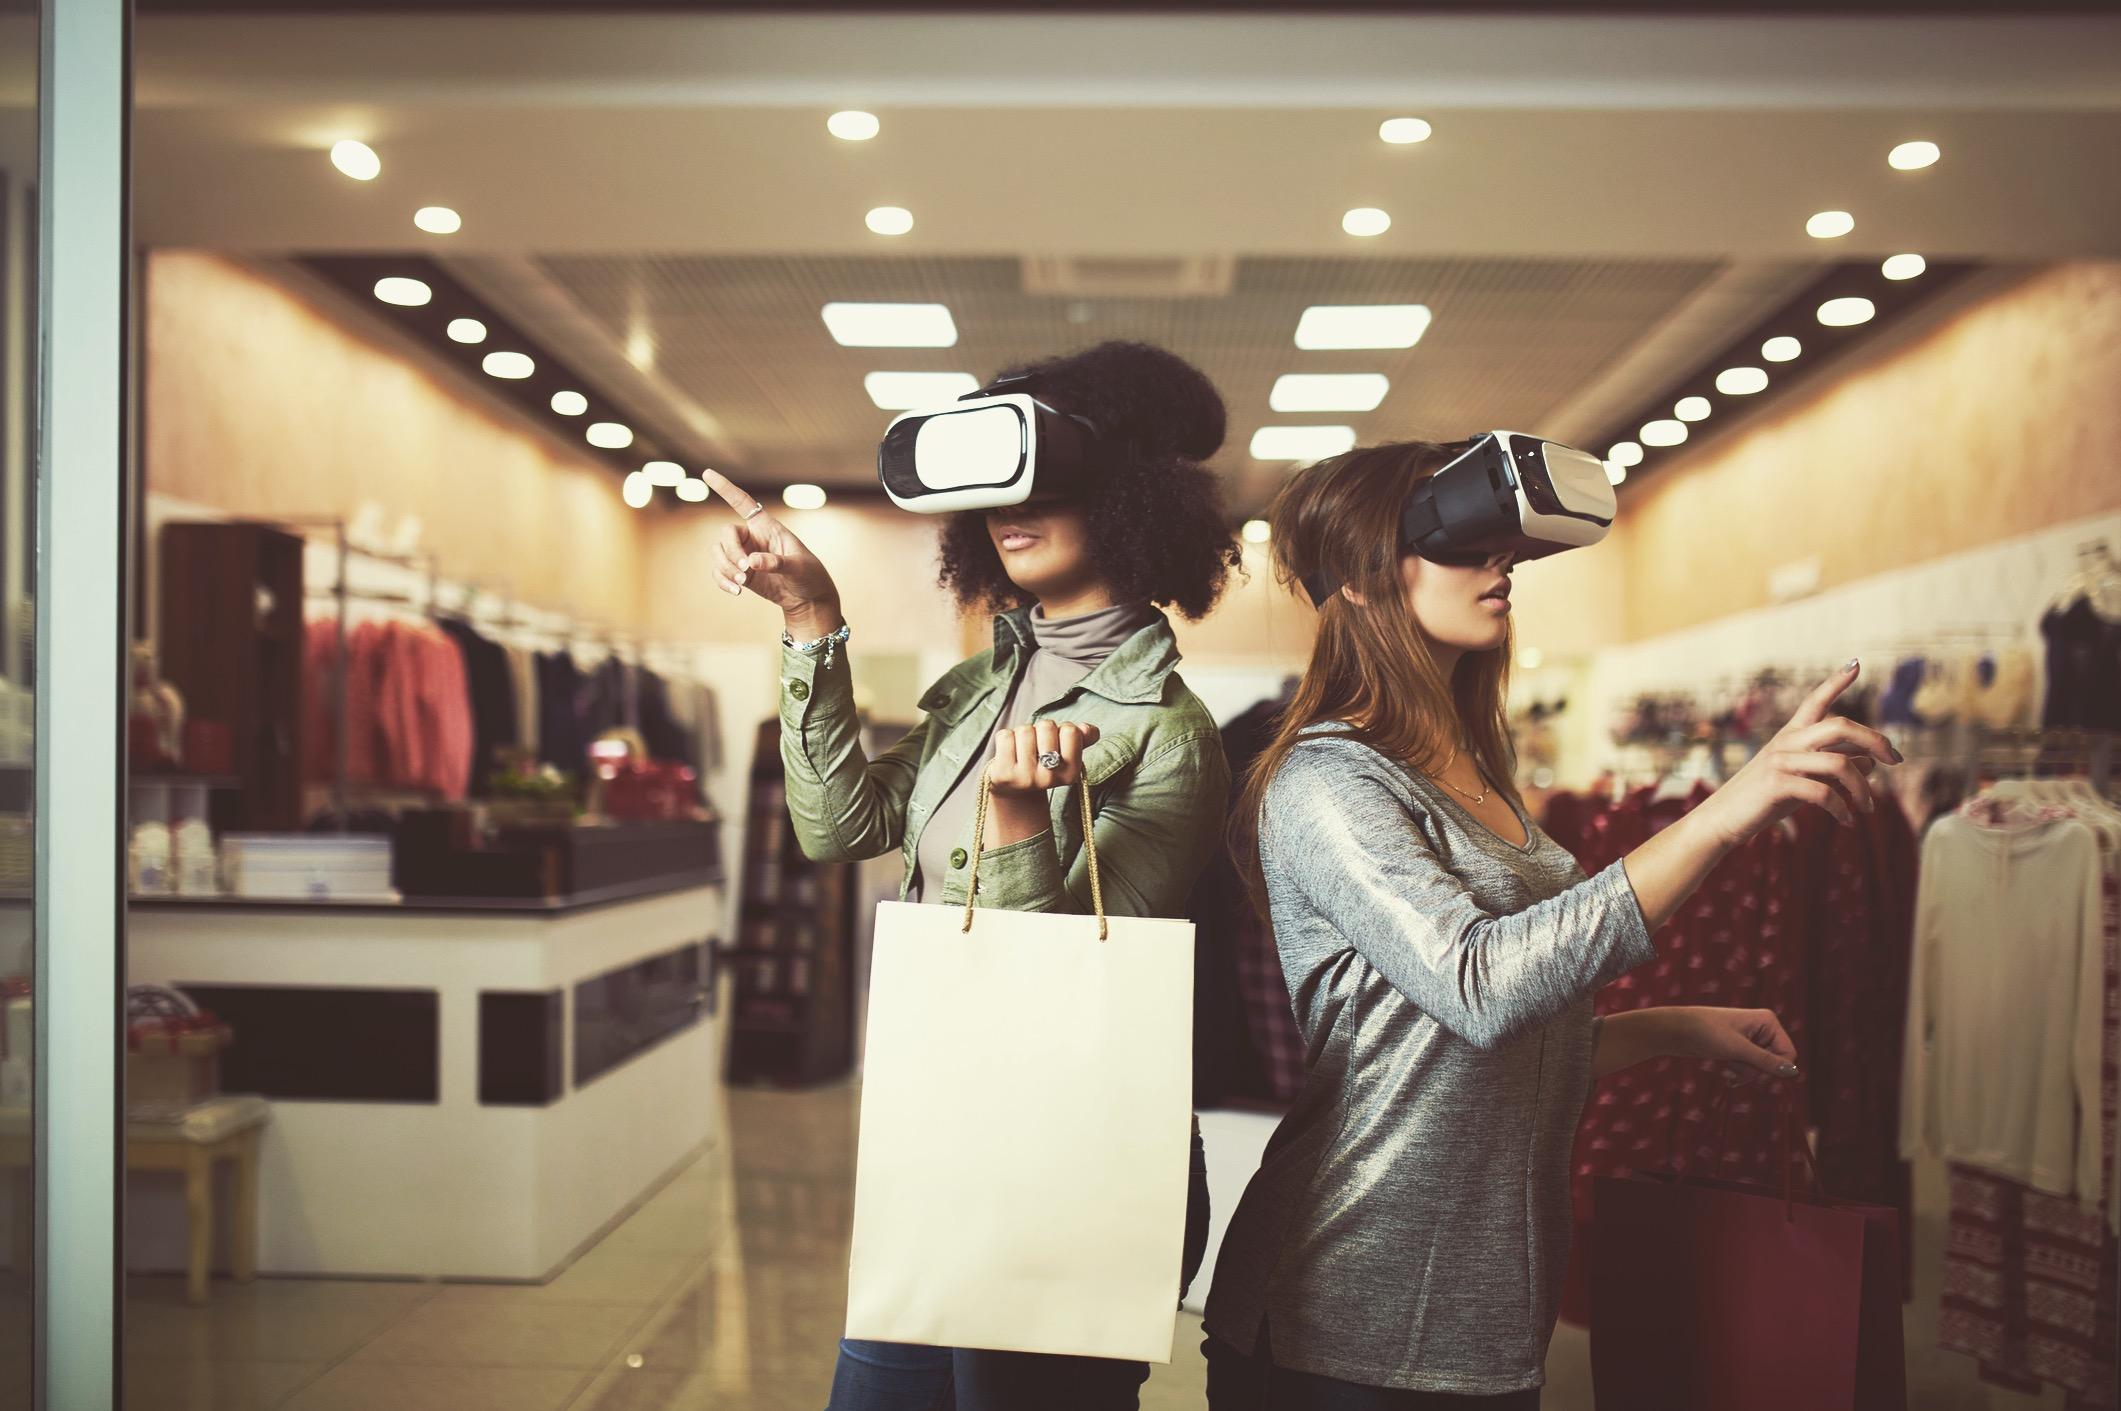 tendances retail 2019